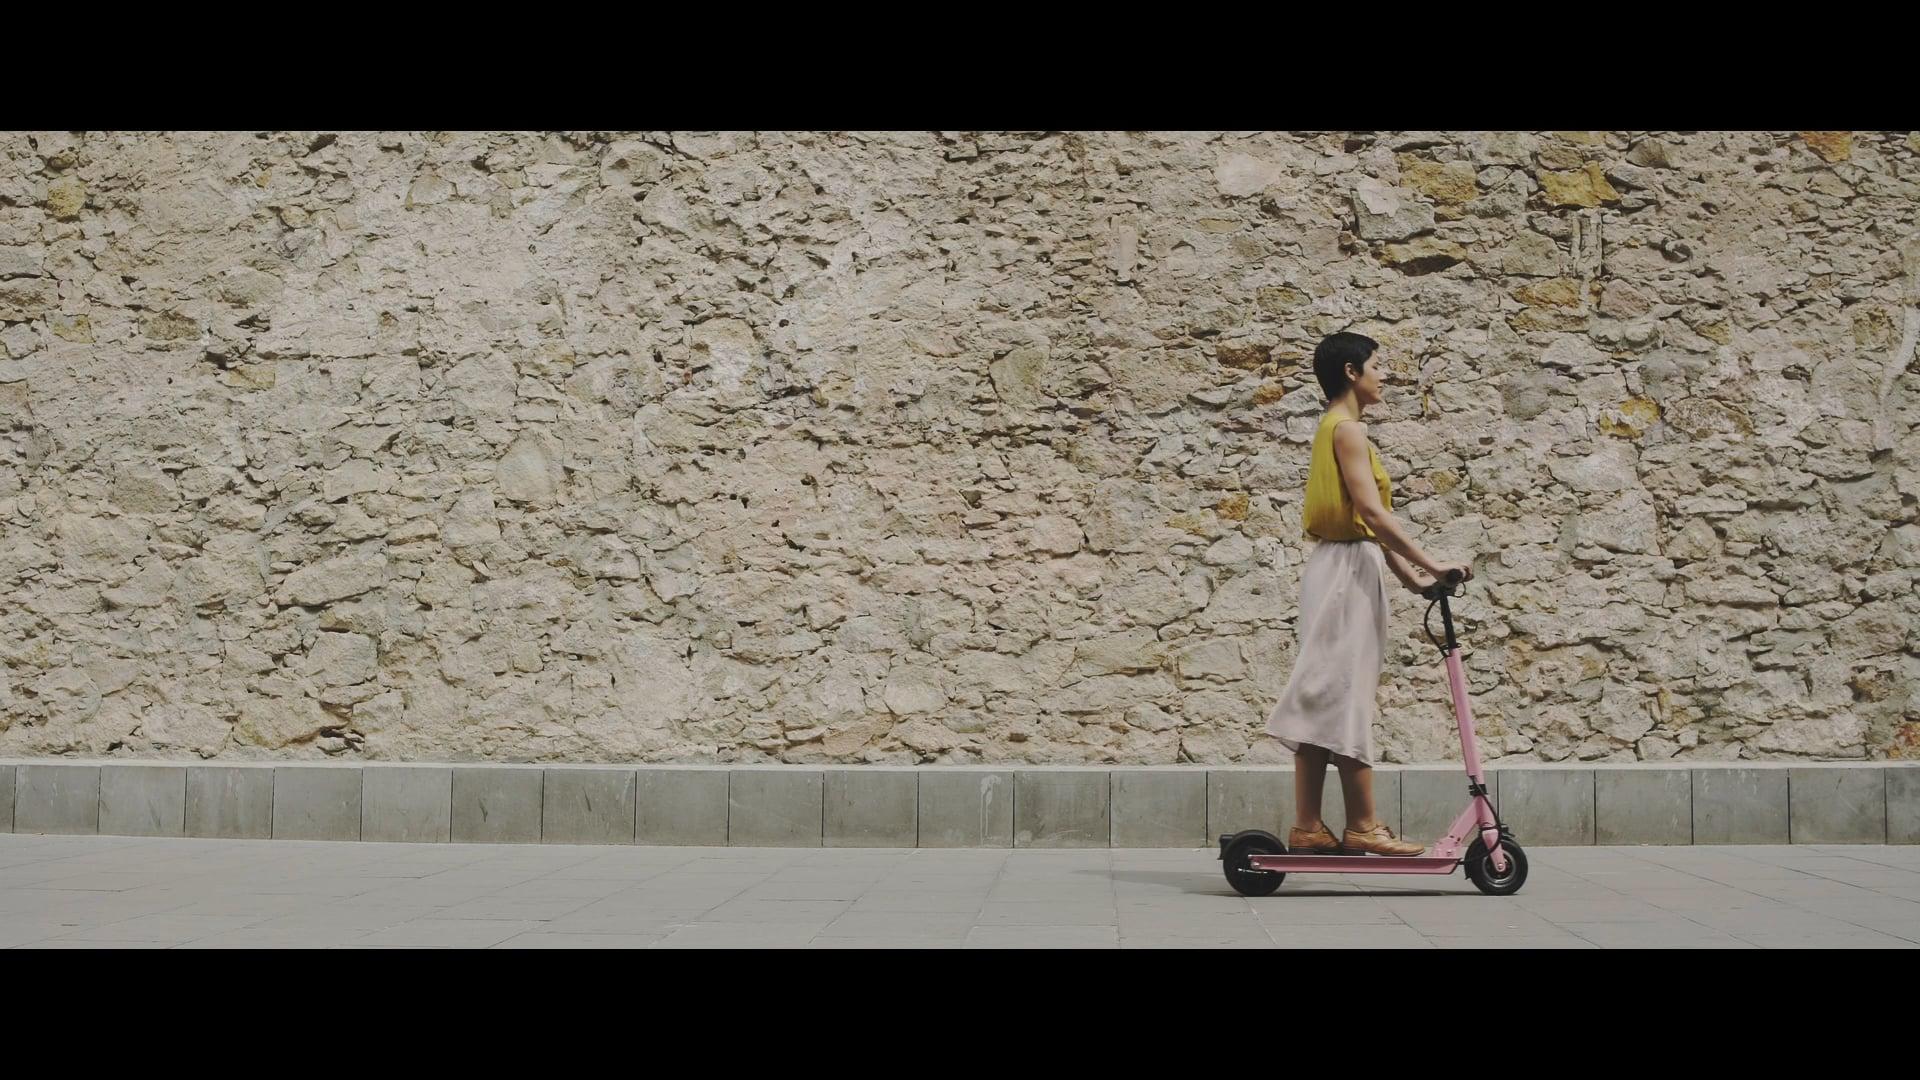 Joyor Scooter - Short Version